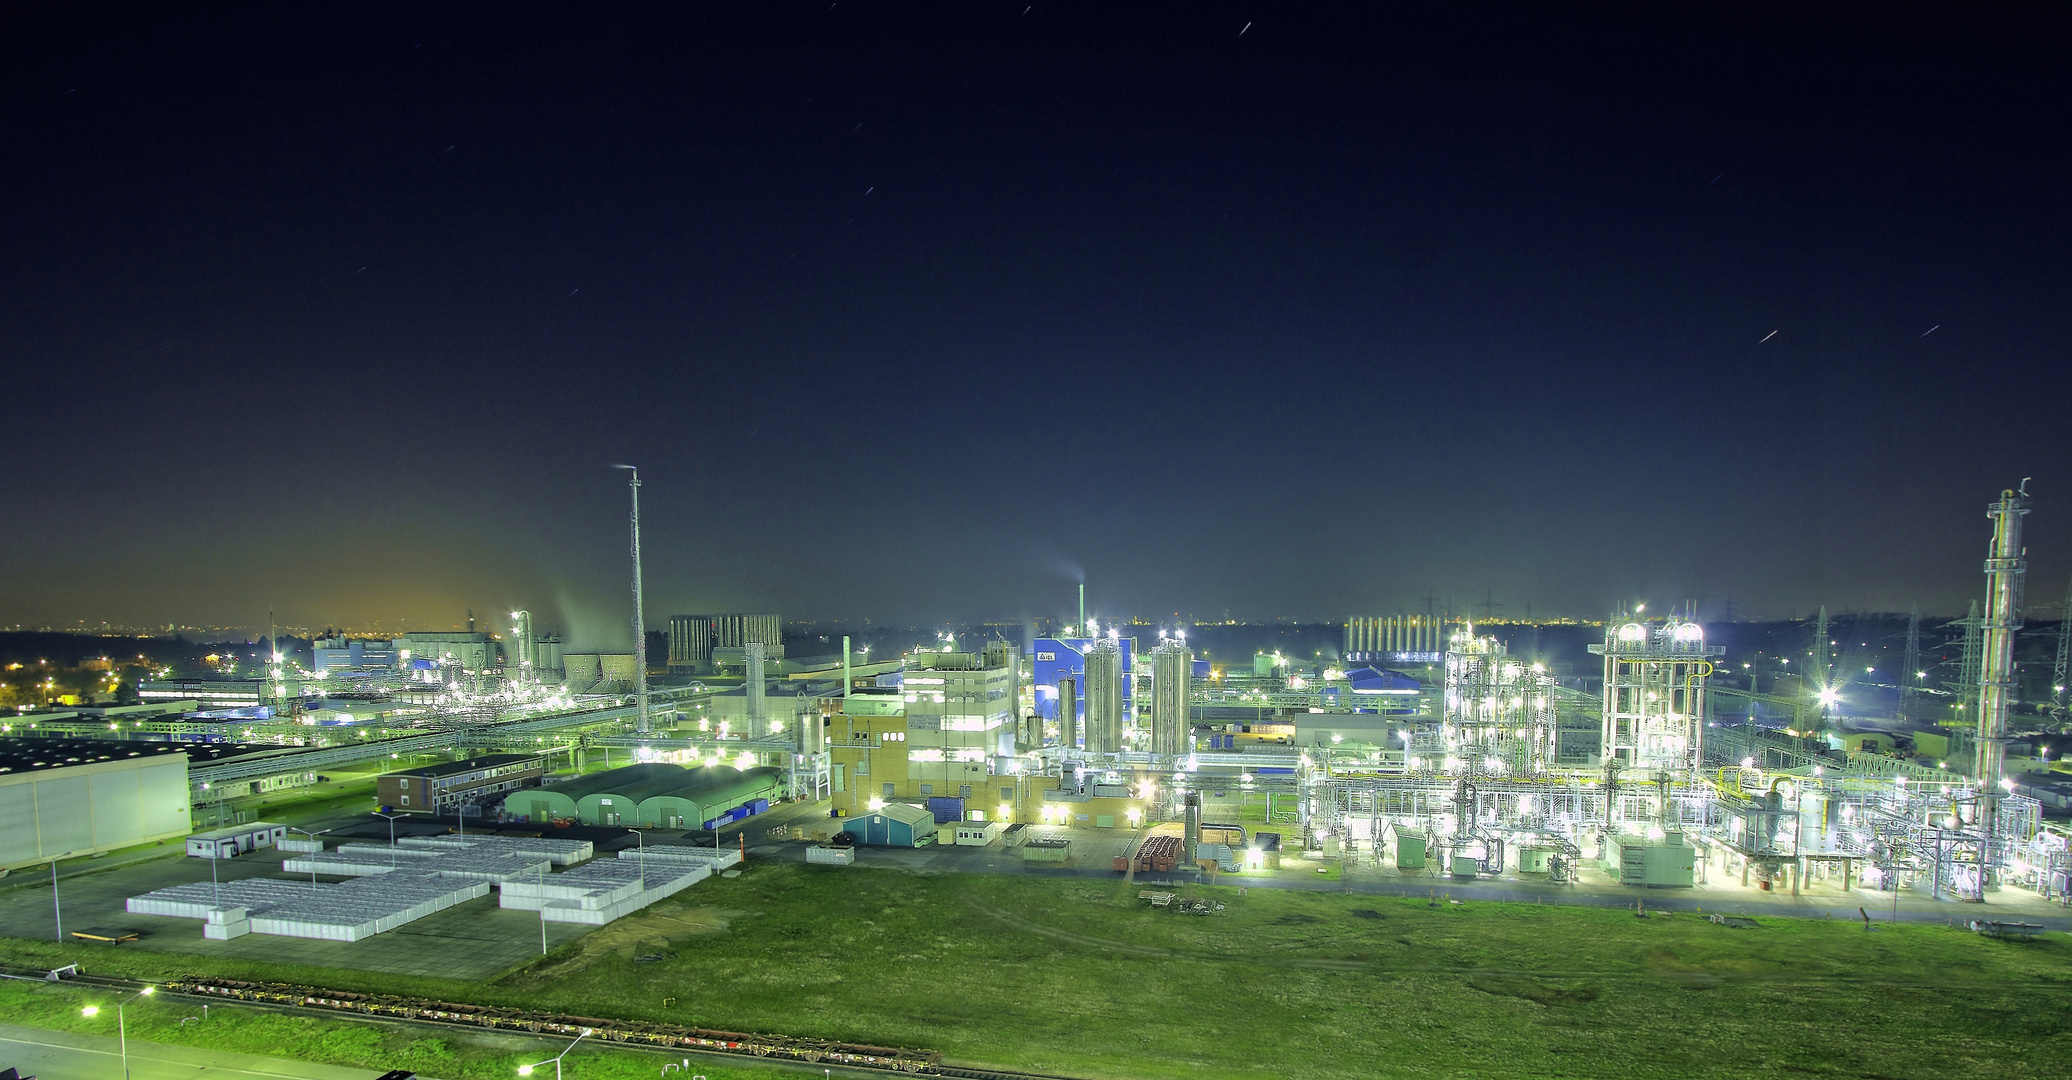 Industrie bei Nacht HDR